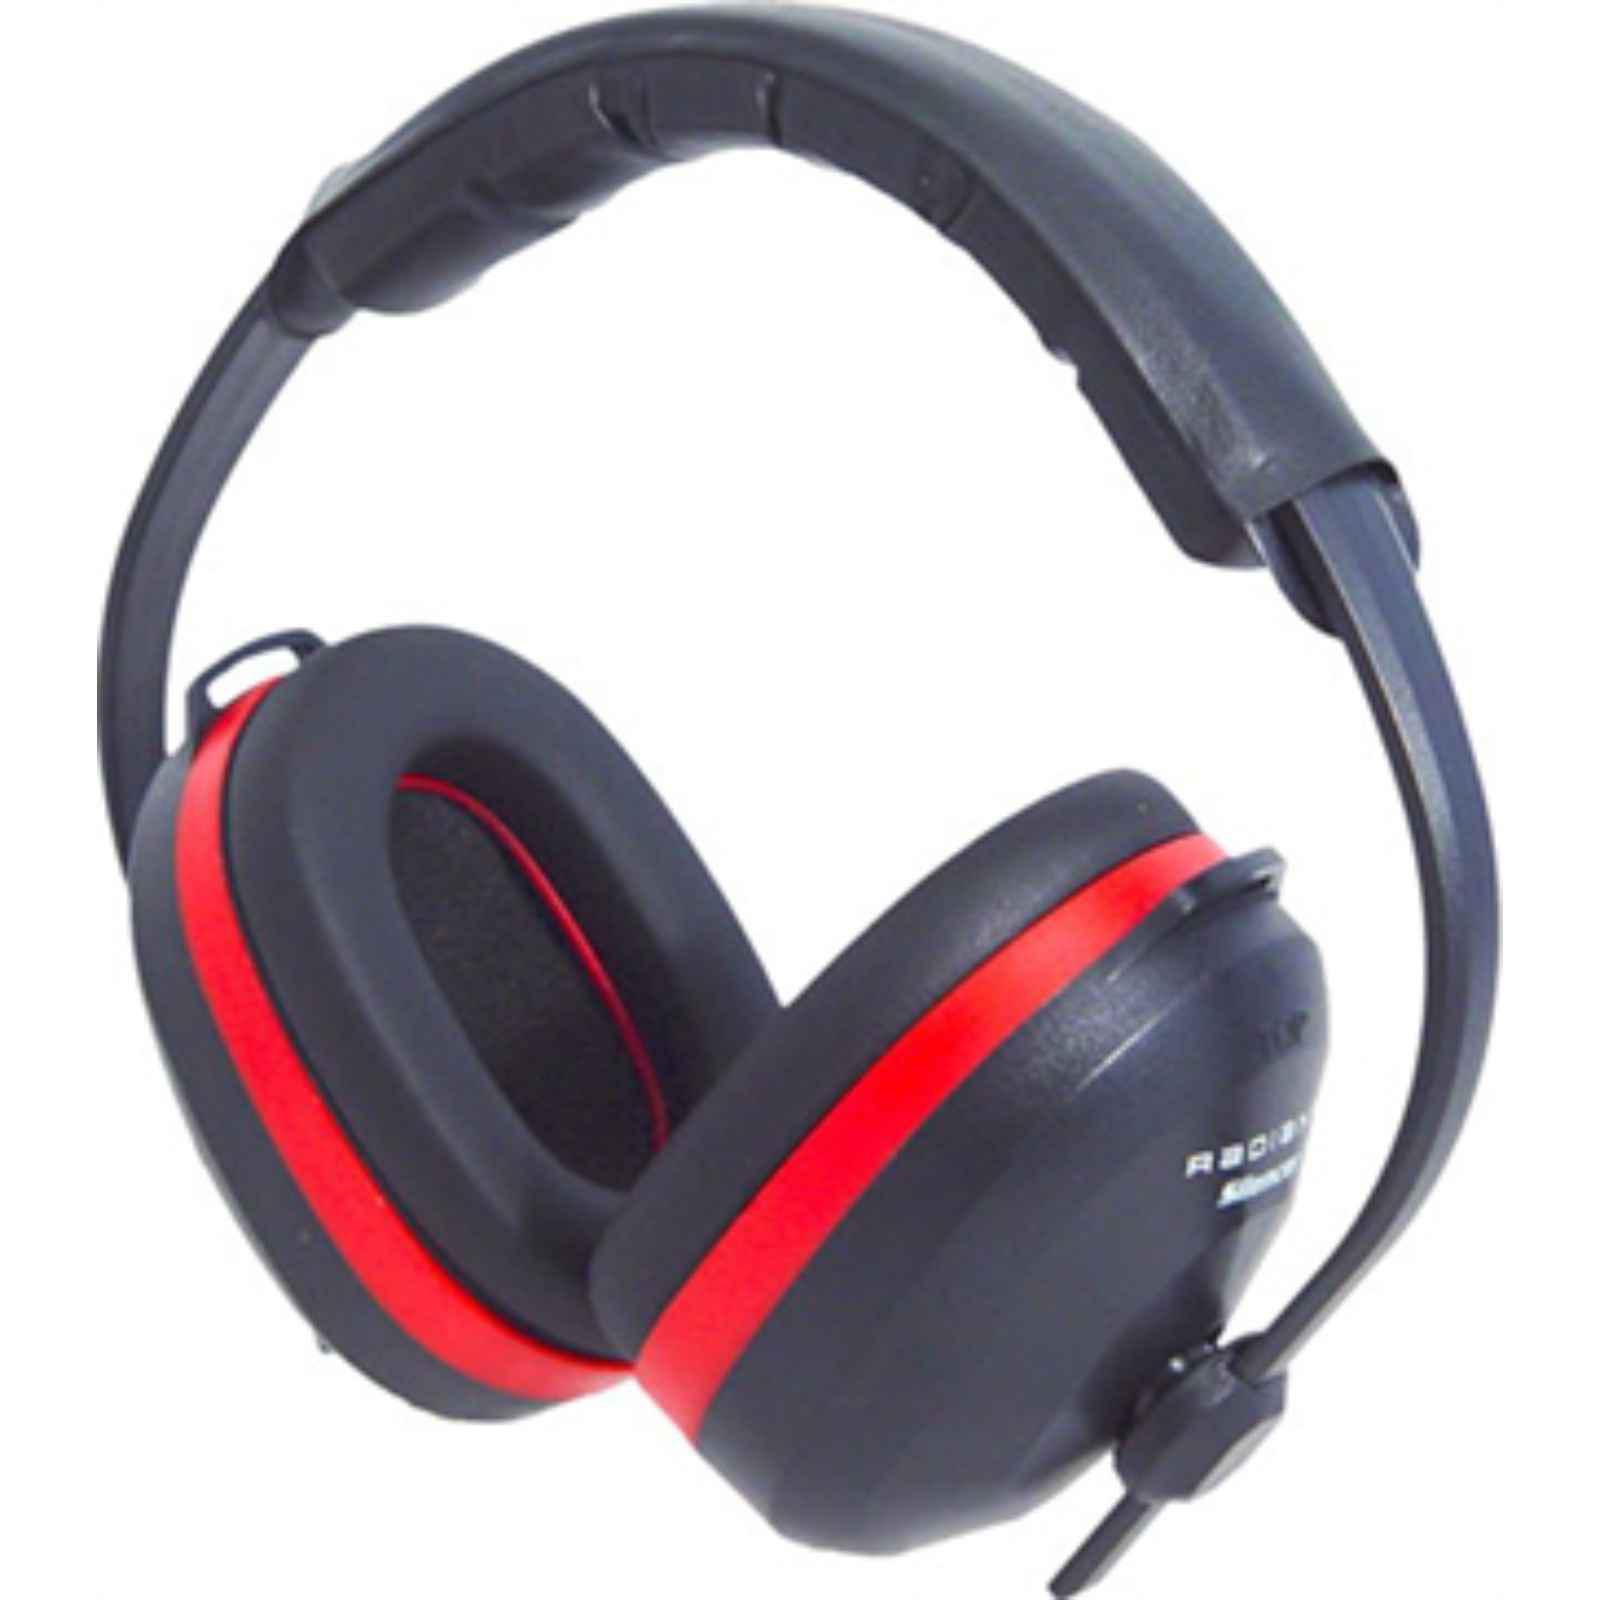 RADIANS SILENCER EARMUFFS NRR 26DB RED/BLACK